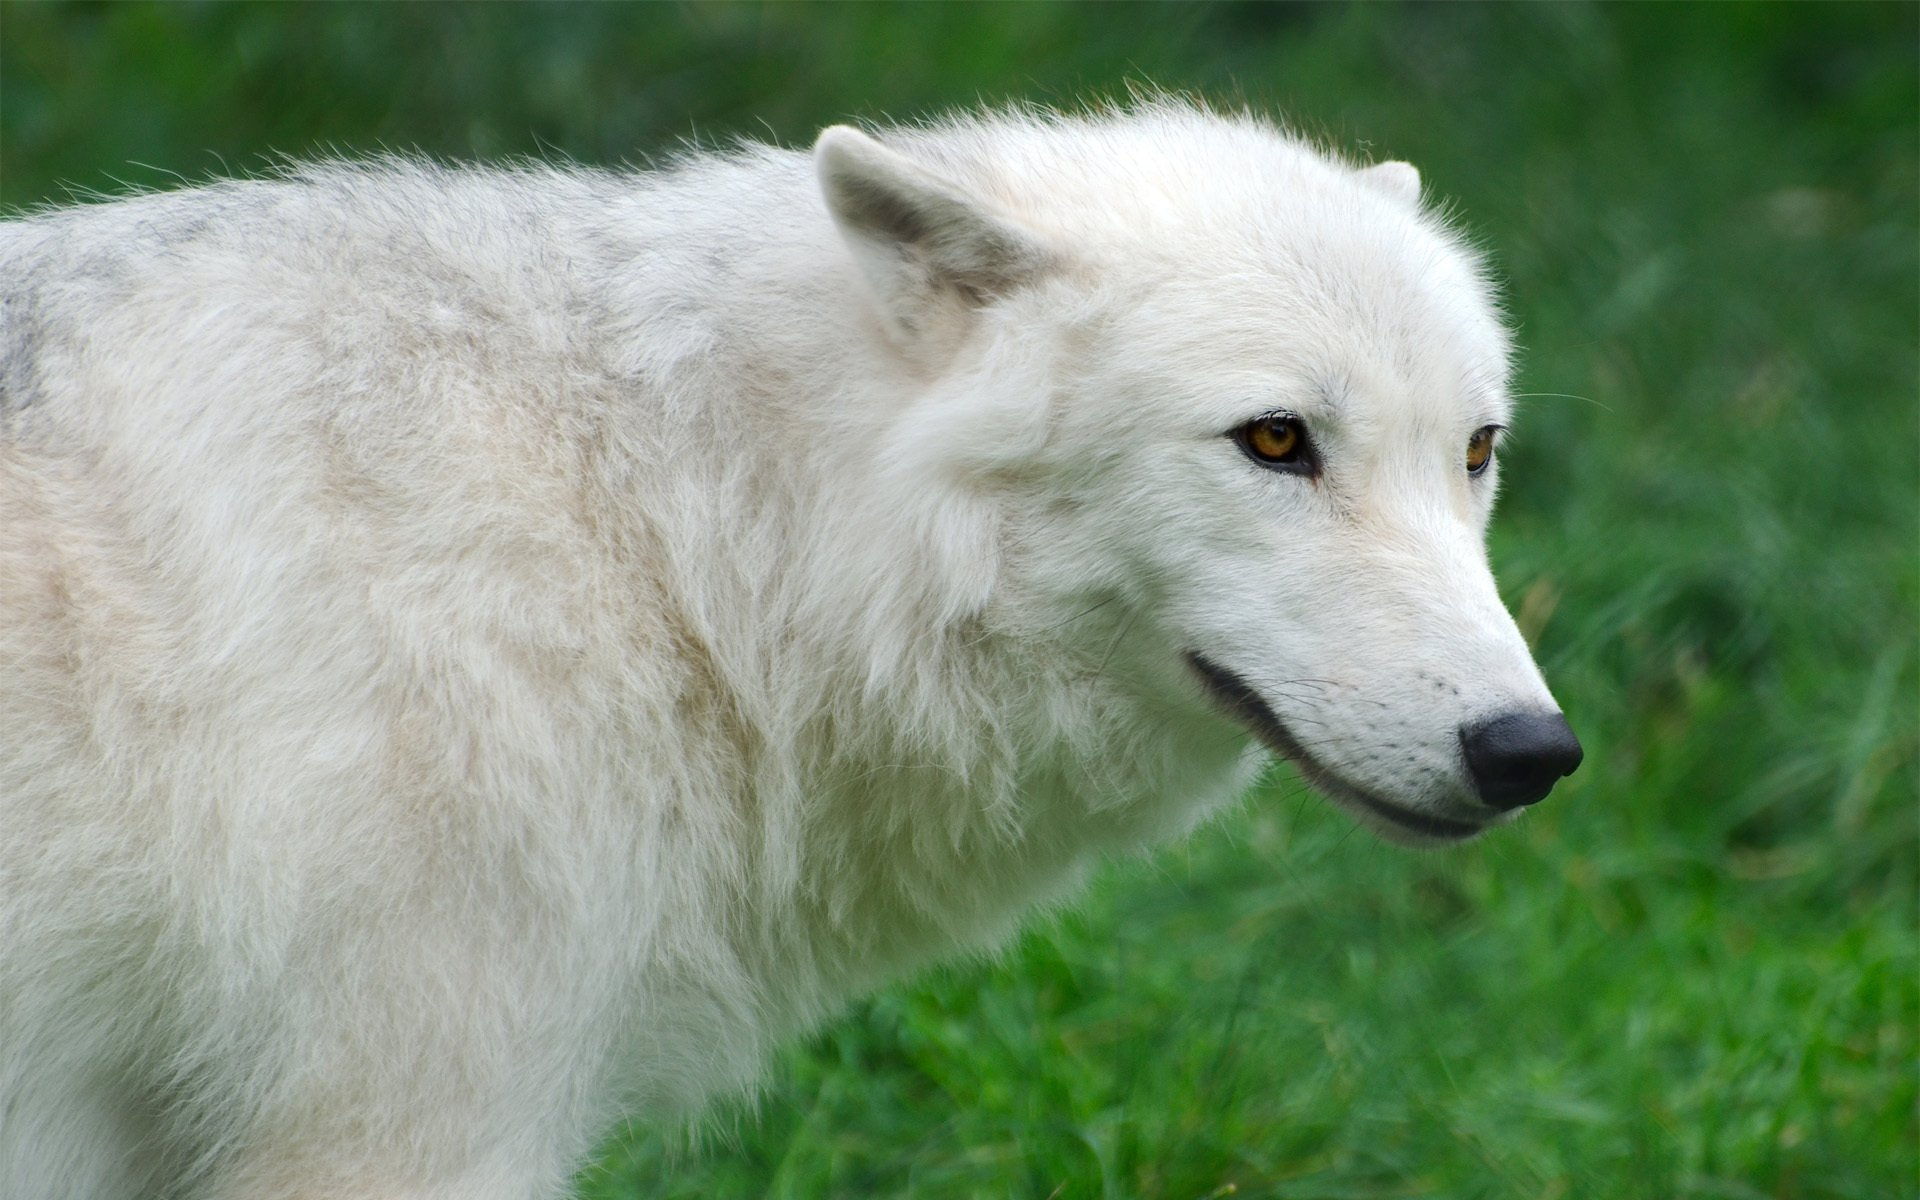 хореографа, картинки про белый волк форума станут депутаты